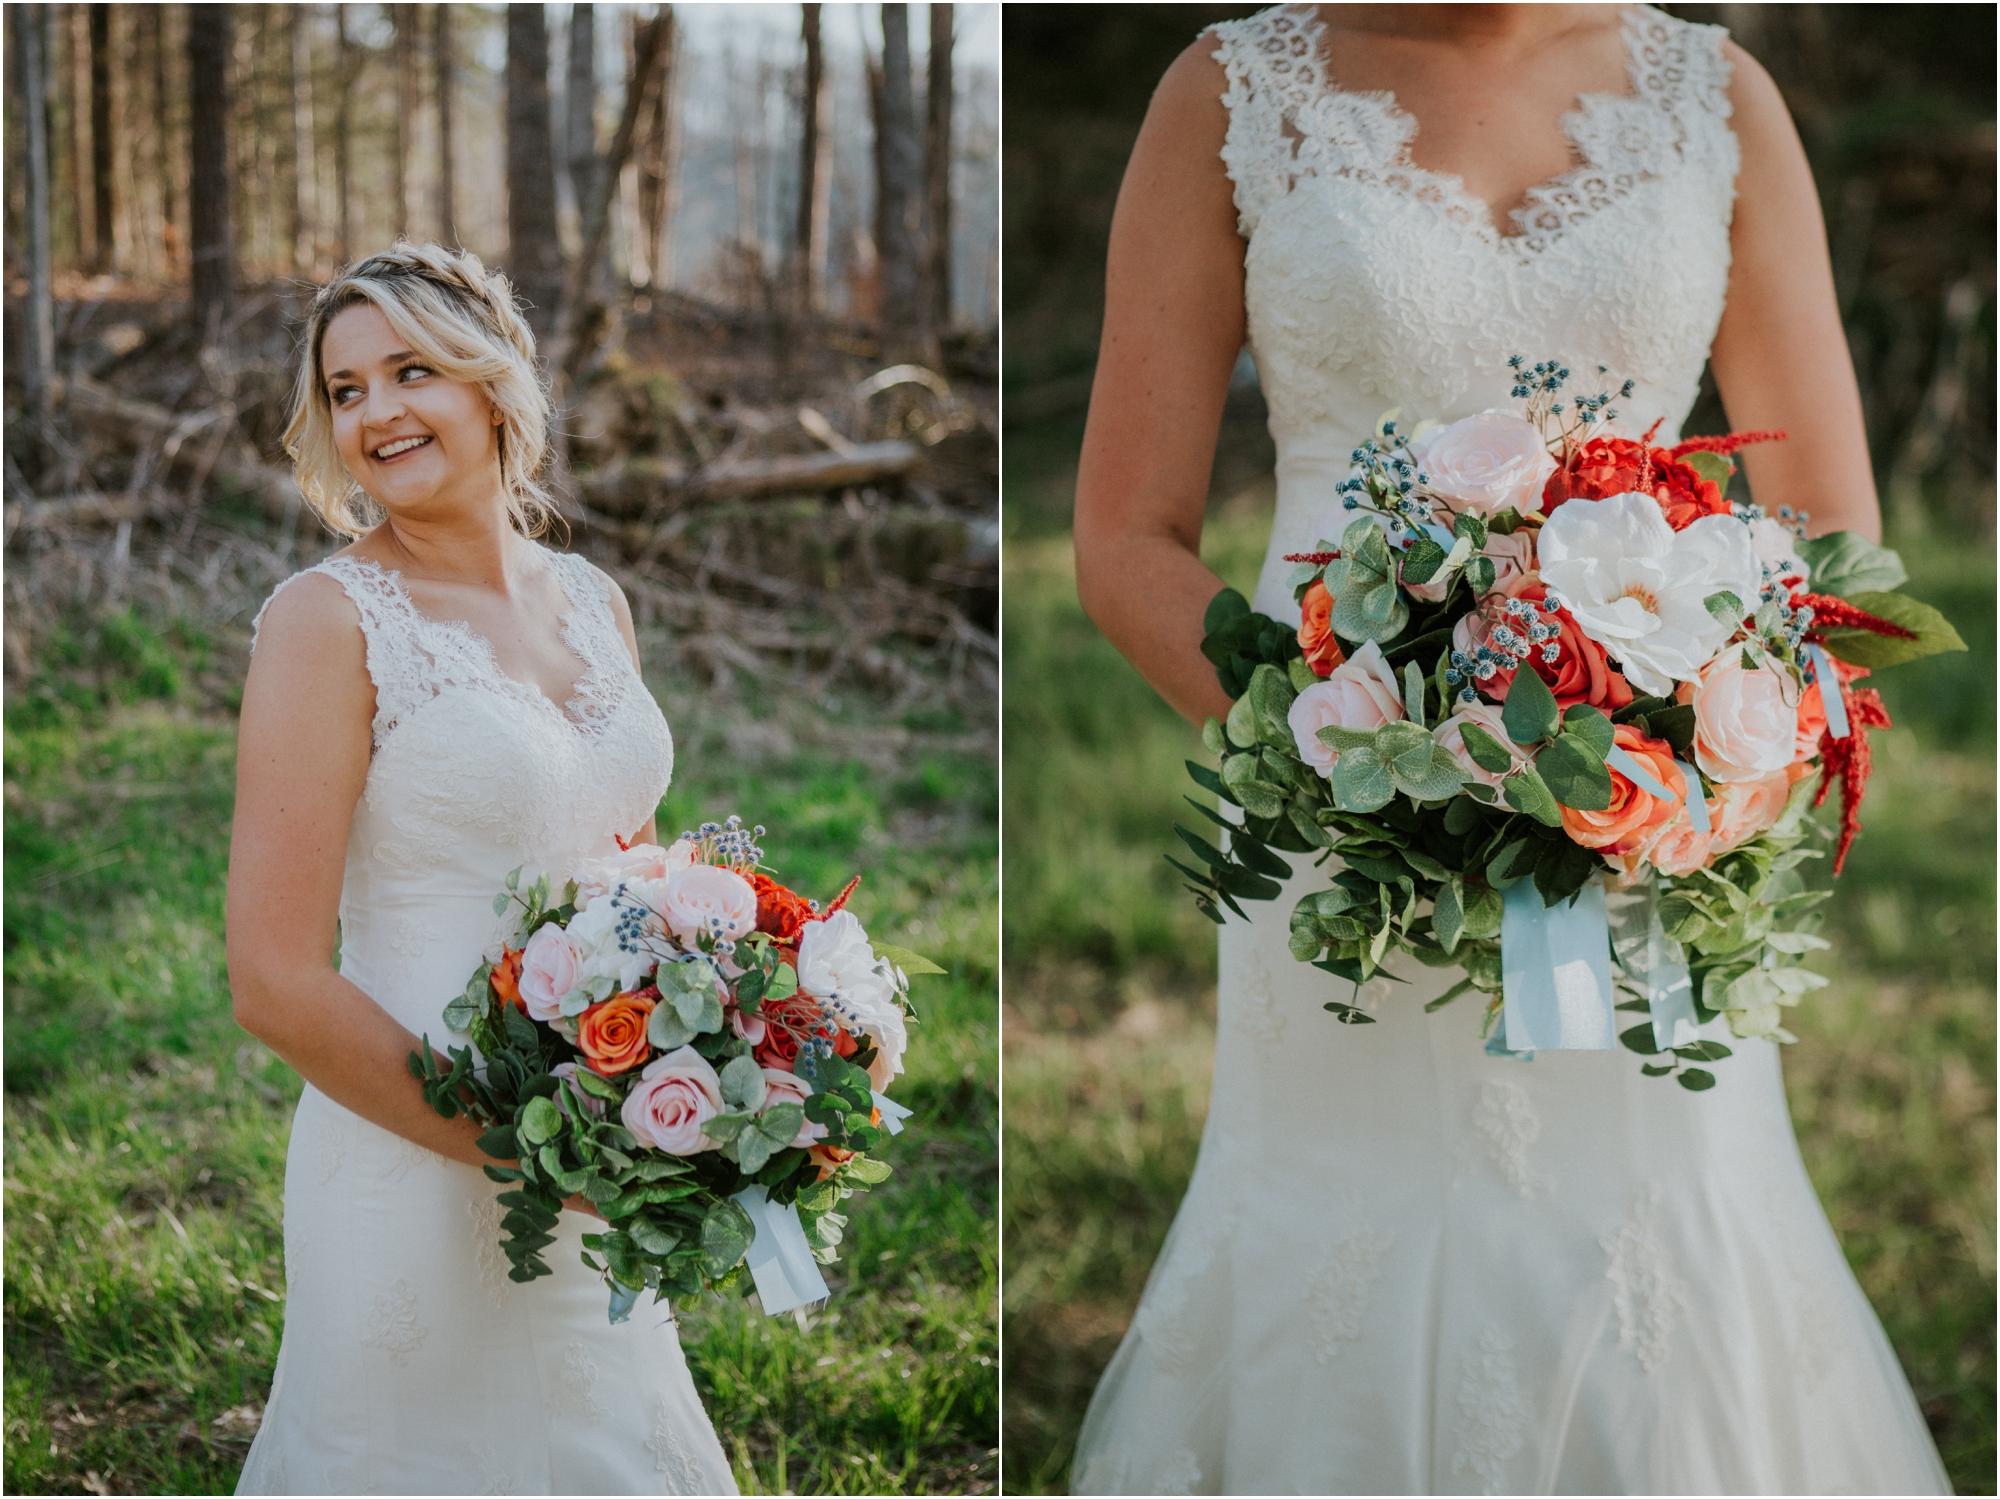 watauga-lake--bohemian-bridal-styled-session-northeast-tennessee-wedding-elopement-photography_0002.jpg